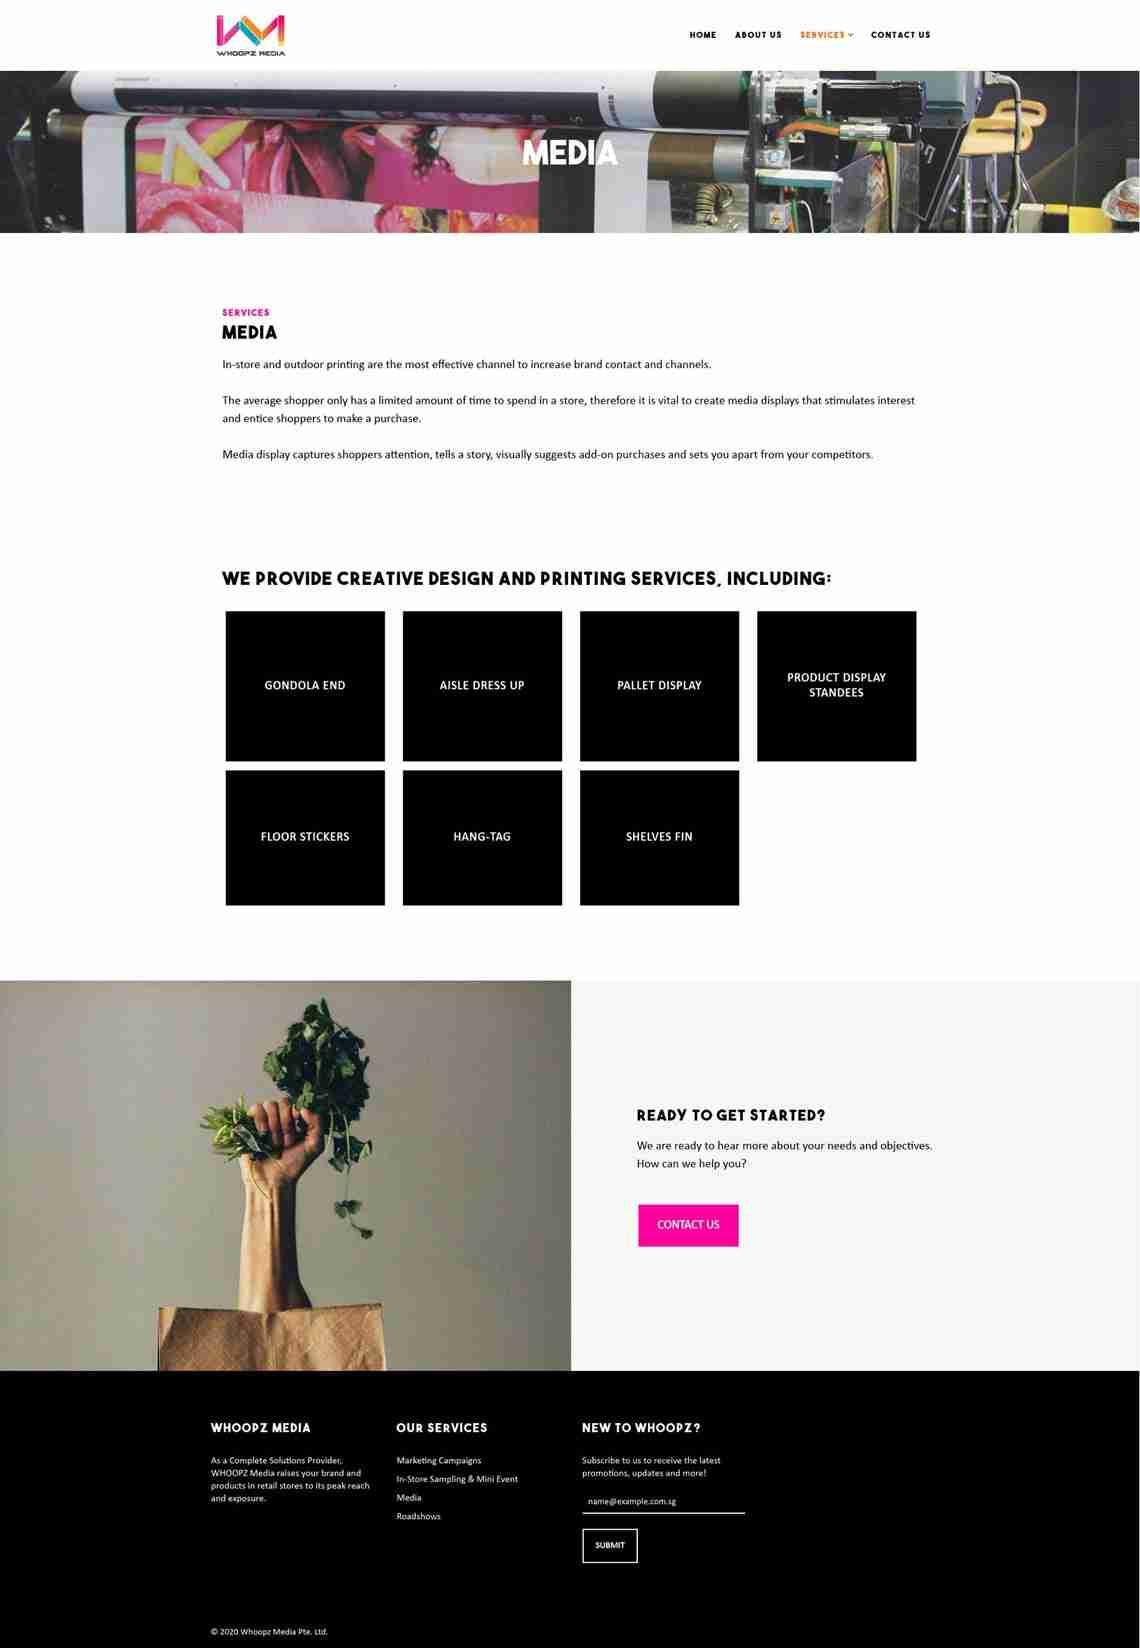 website design services for Whoopz Media